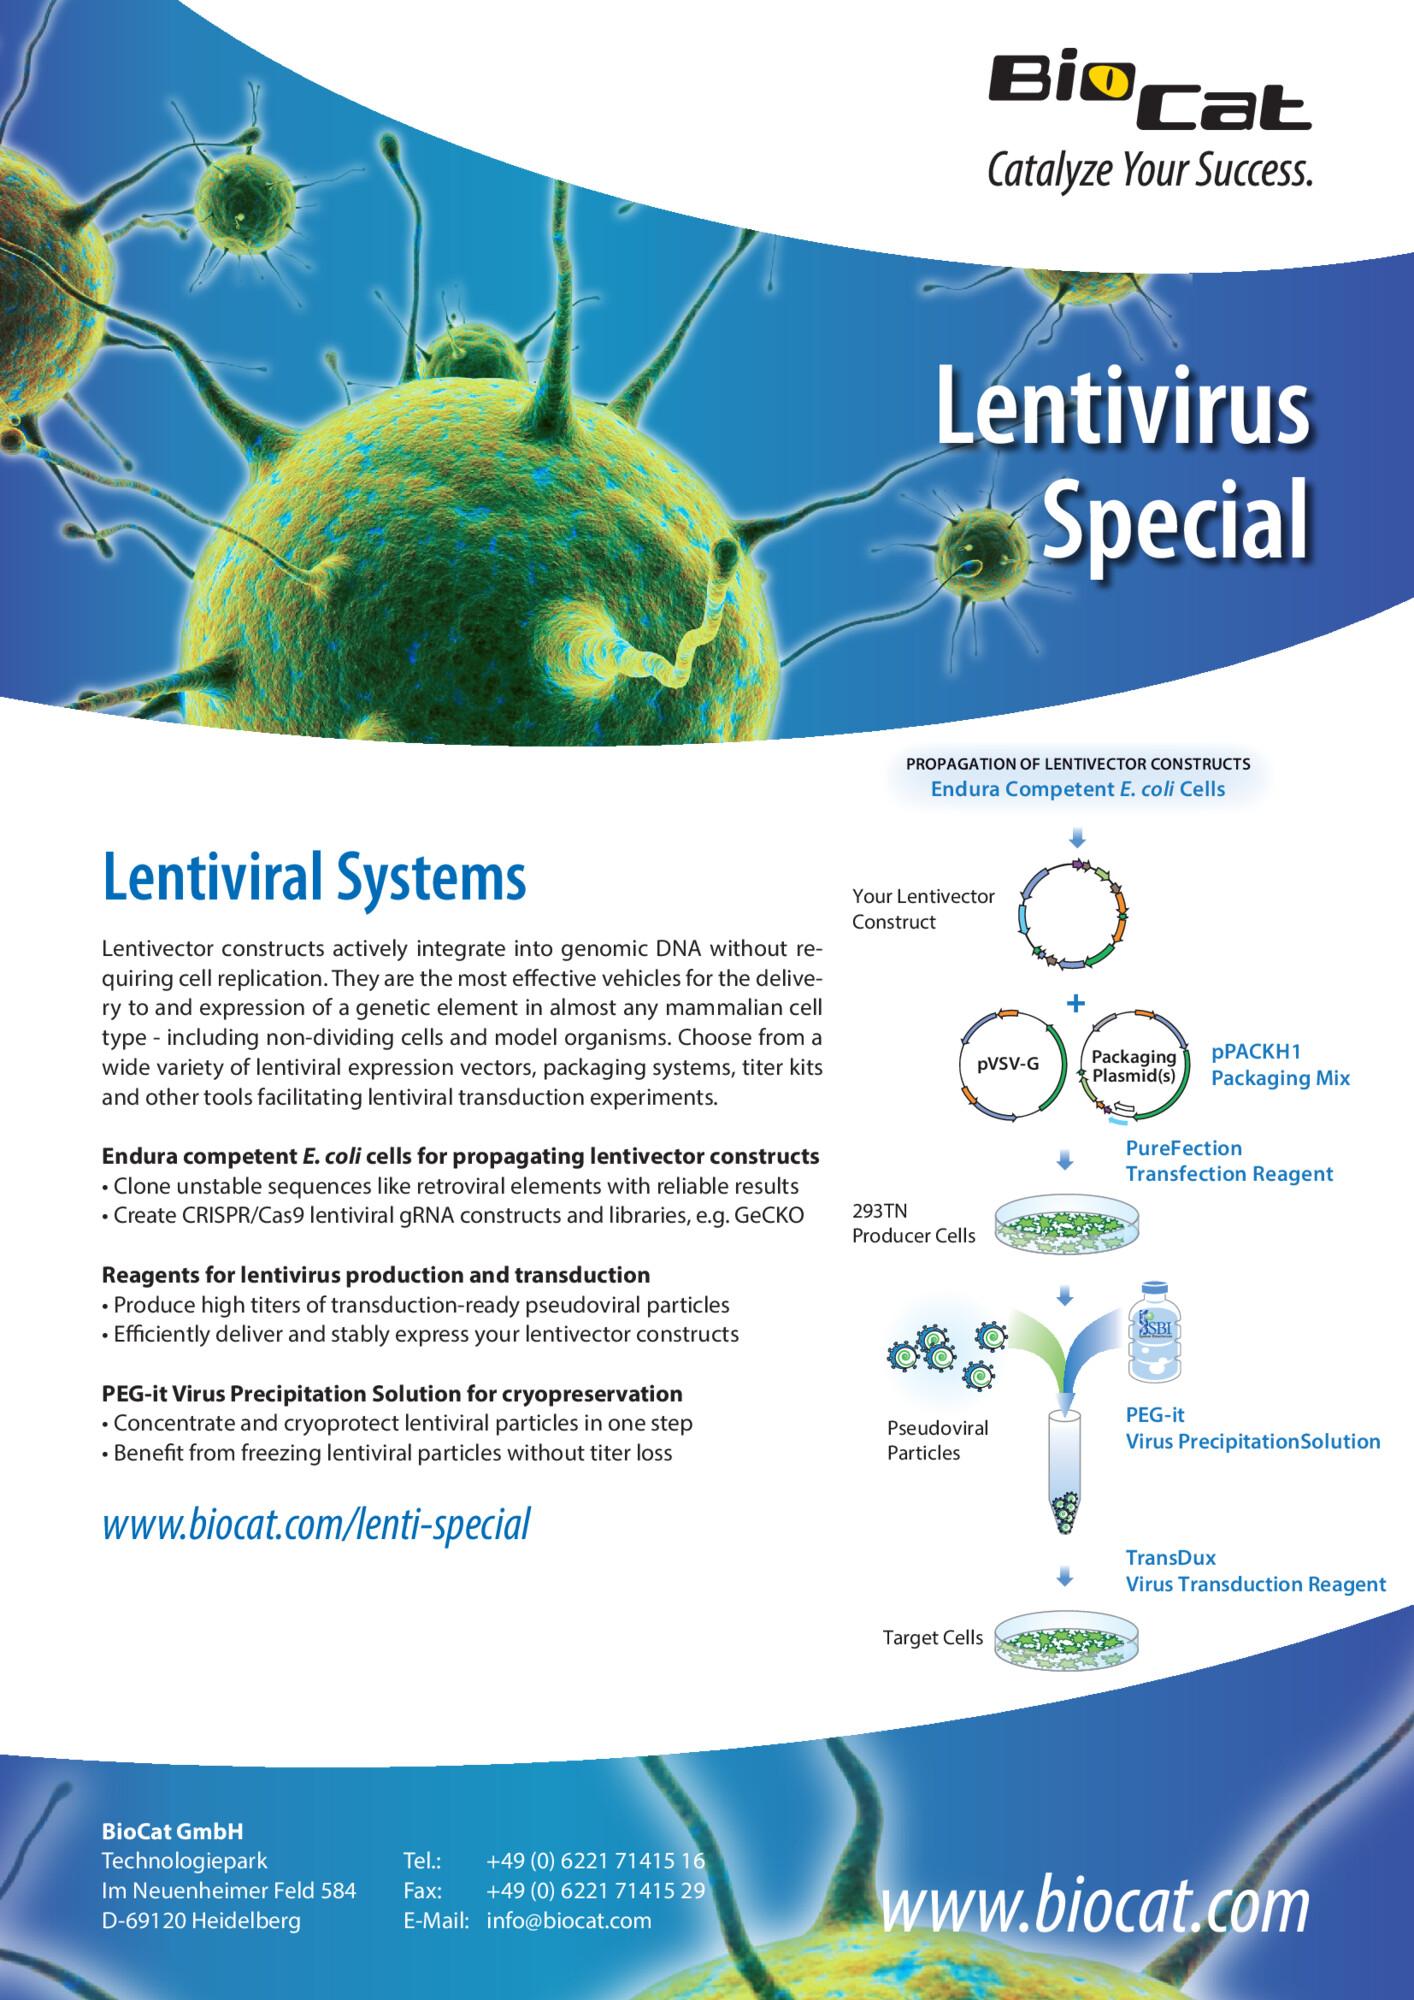 Lenti_Special_20180820.pdf Preview